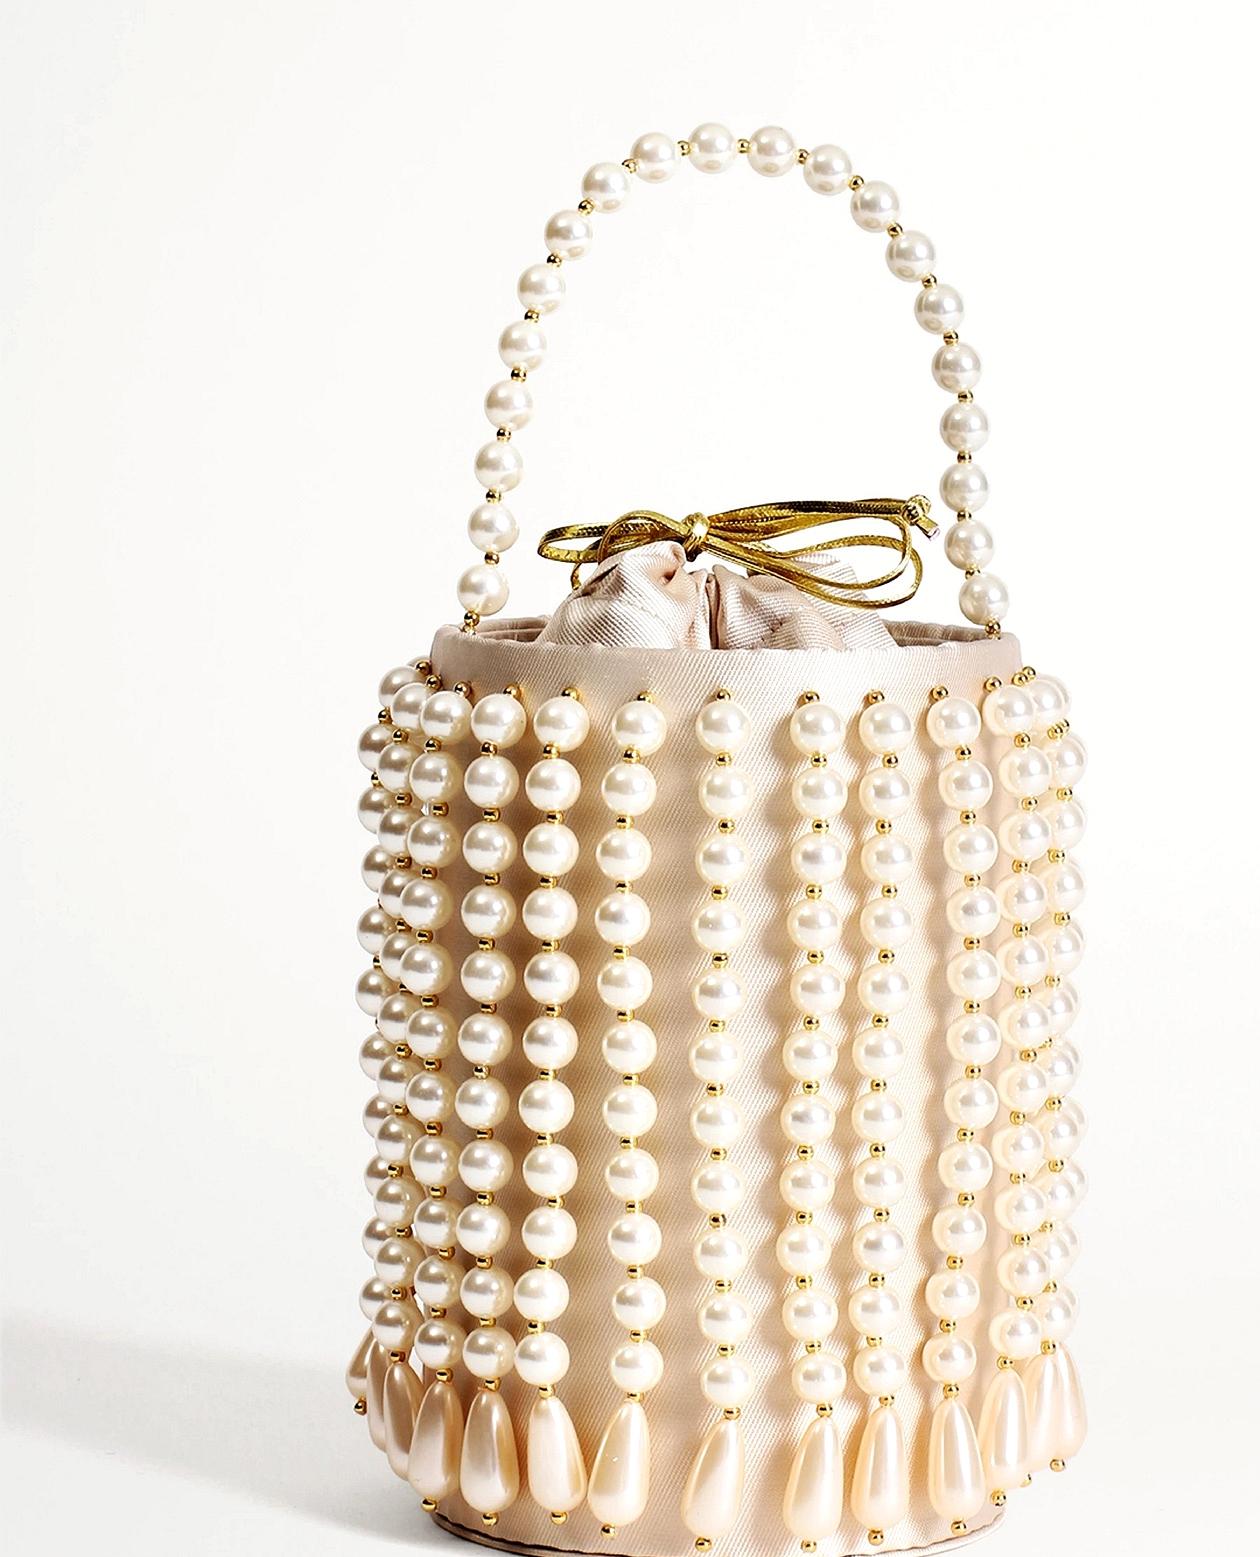 Bridgerton-Inspired Pearl Handbag